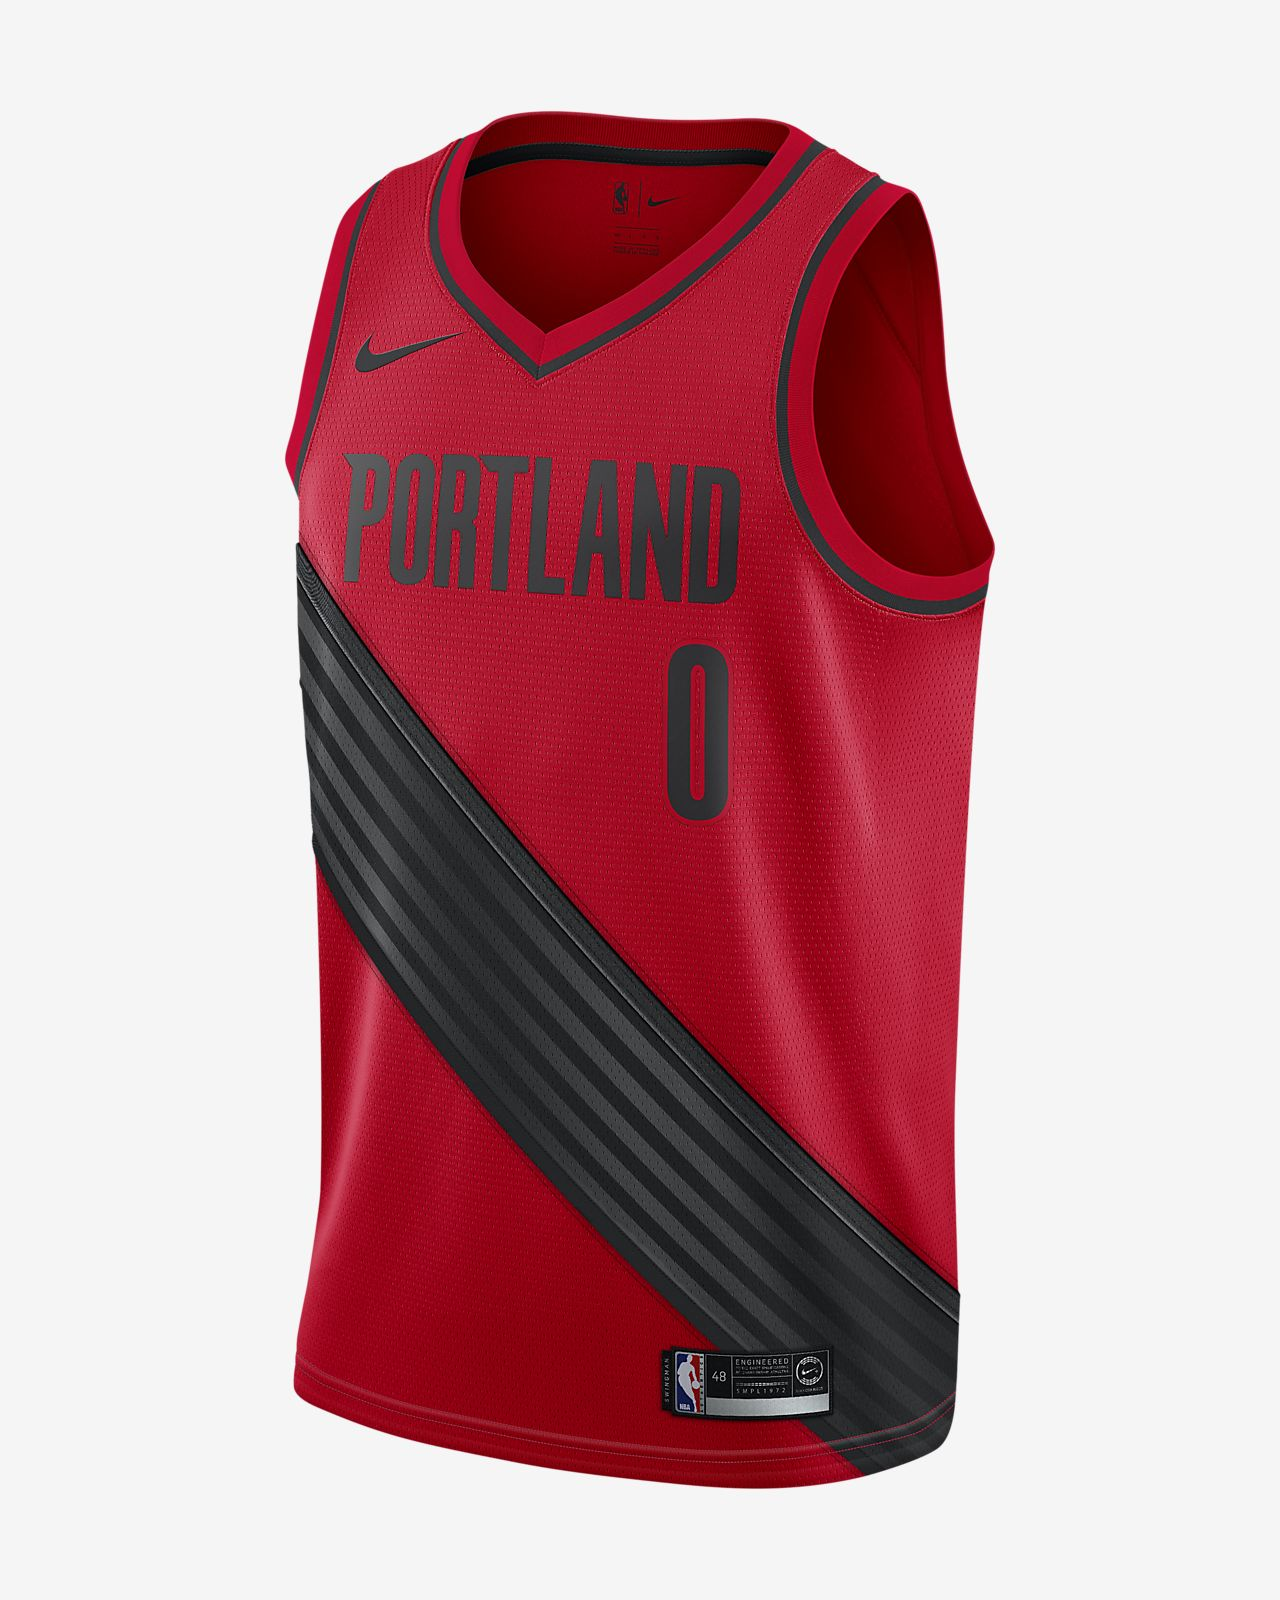 Men s Nike NBA Connected Jersey. Damian Lillard Statement Edition Swingman (Portland  Trail Blazers) fdccee69a